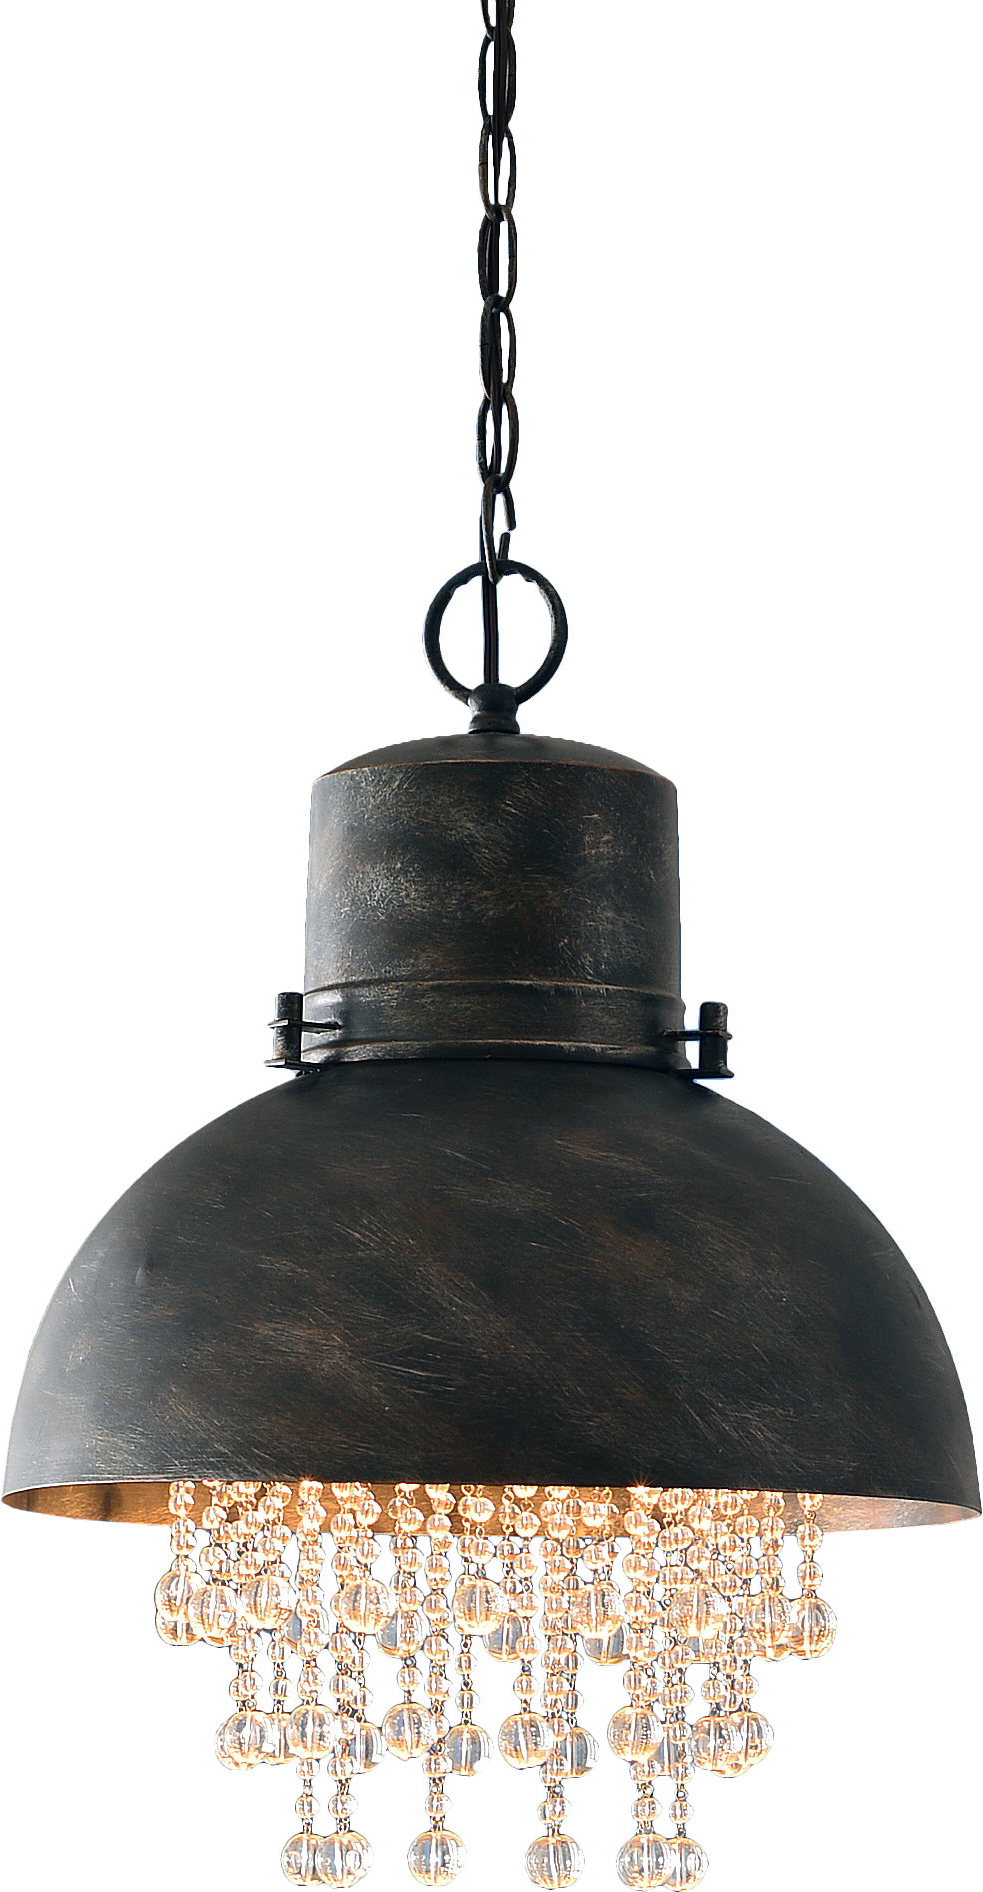 Monadnock 1 Light Single Dome Pendants For Popular Monadnock 1 Light Dome Pendant (Gallery 4 of 20)